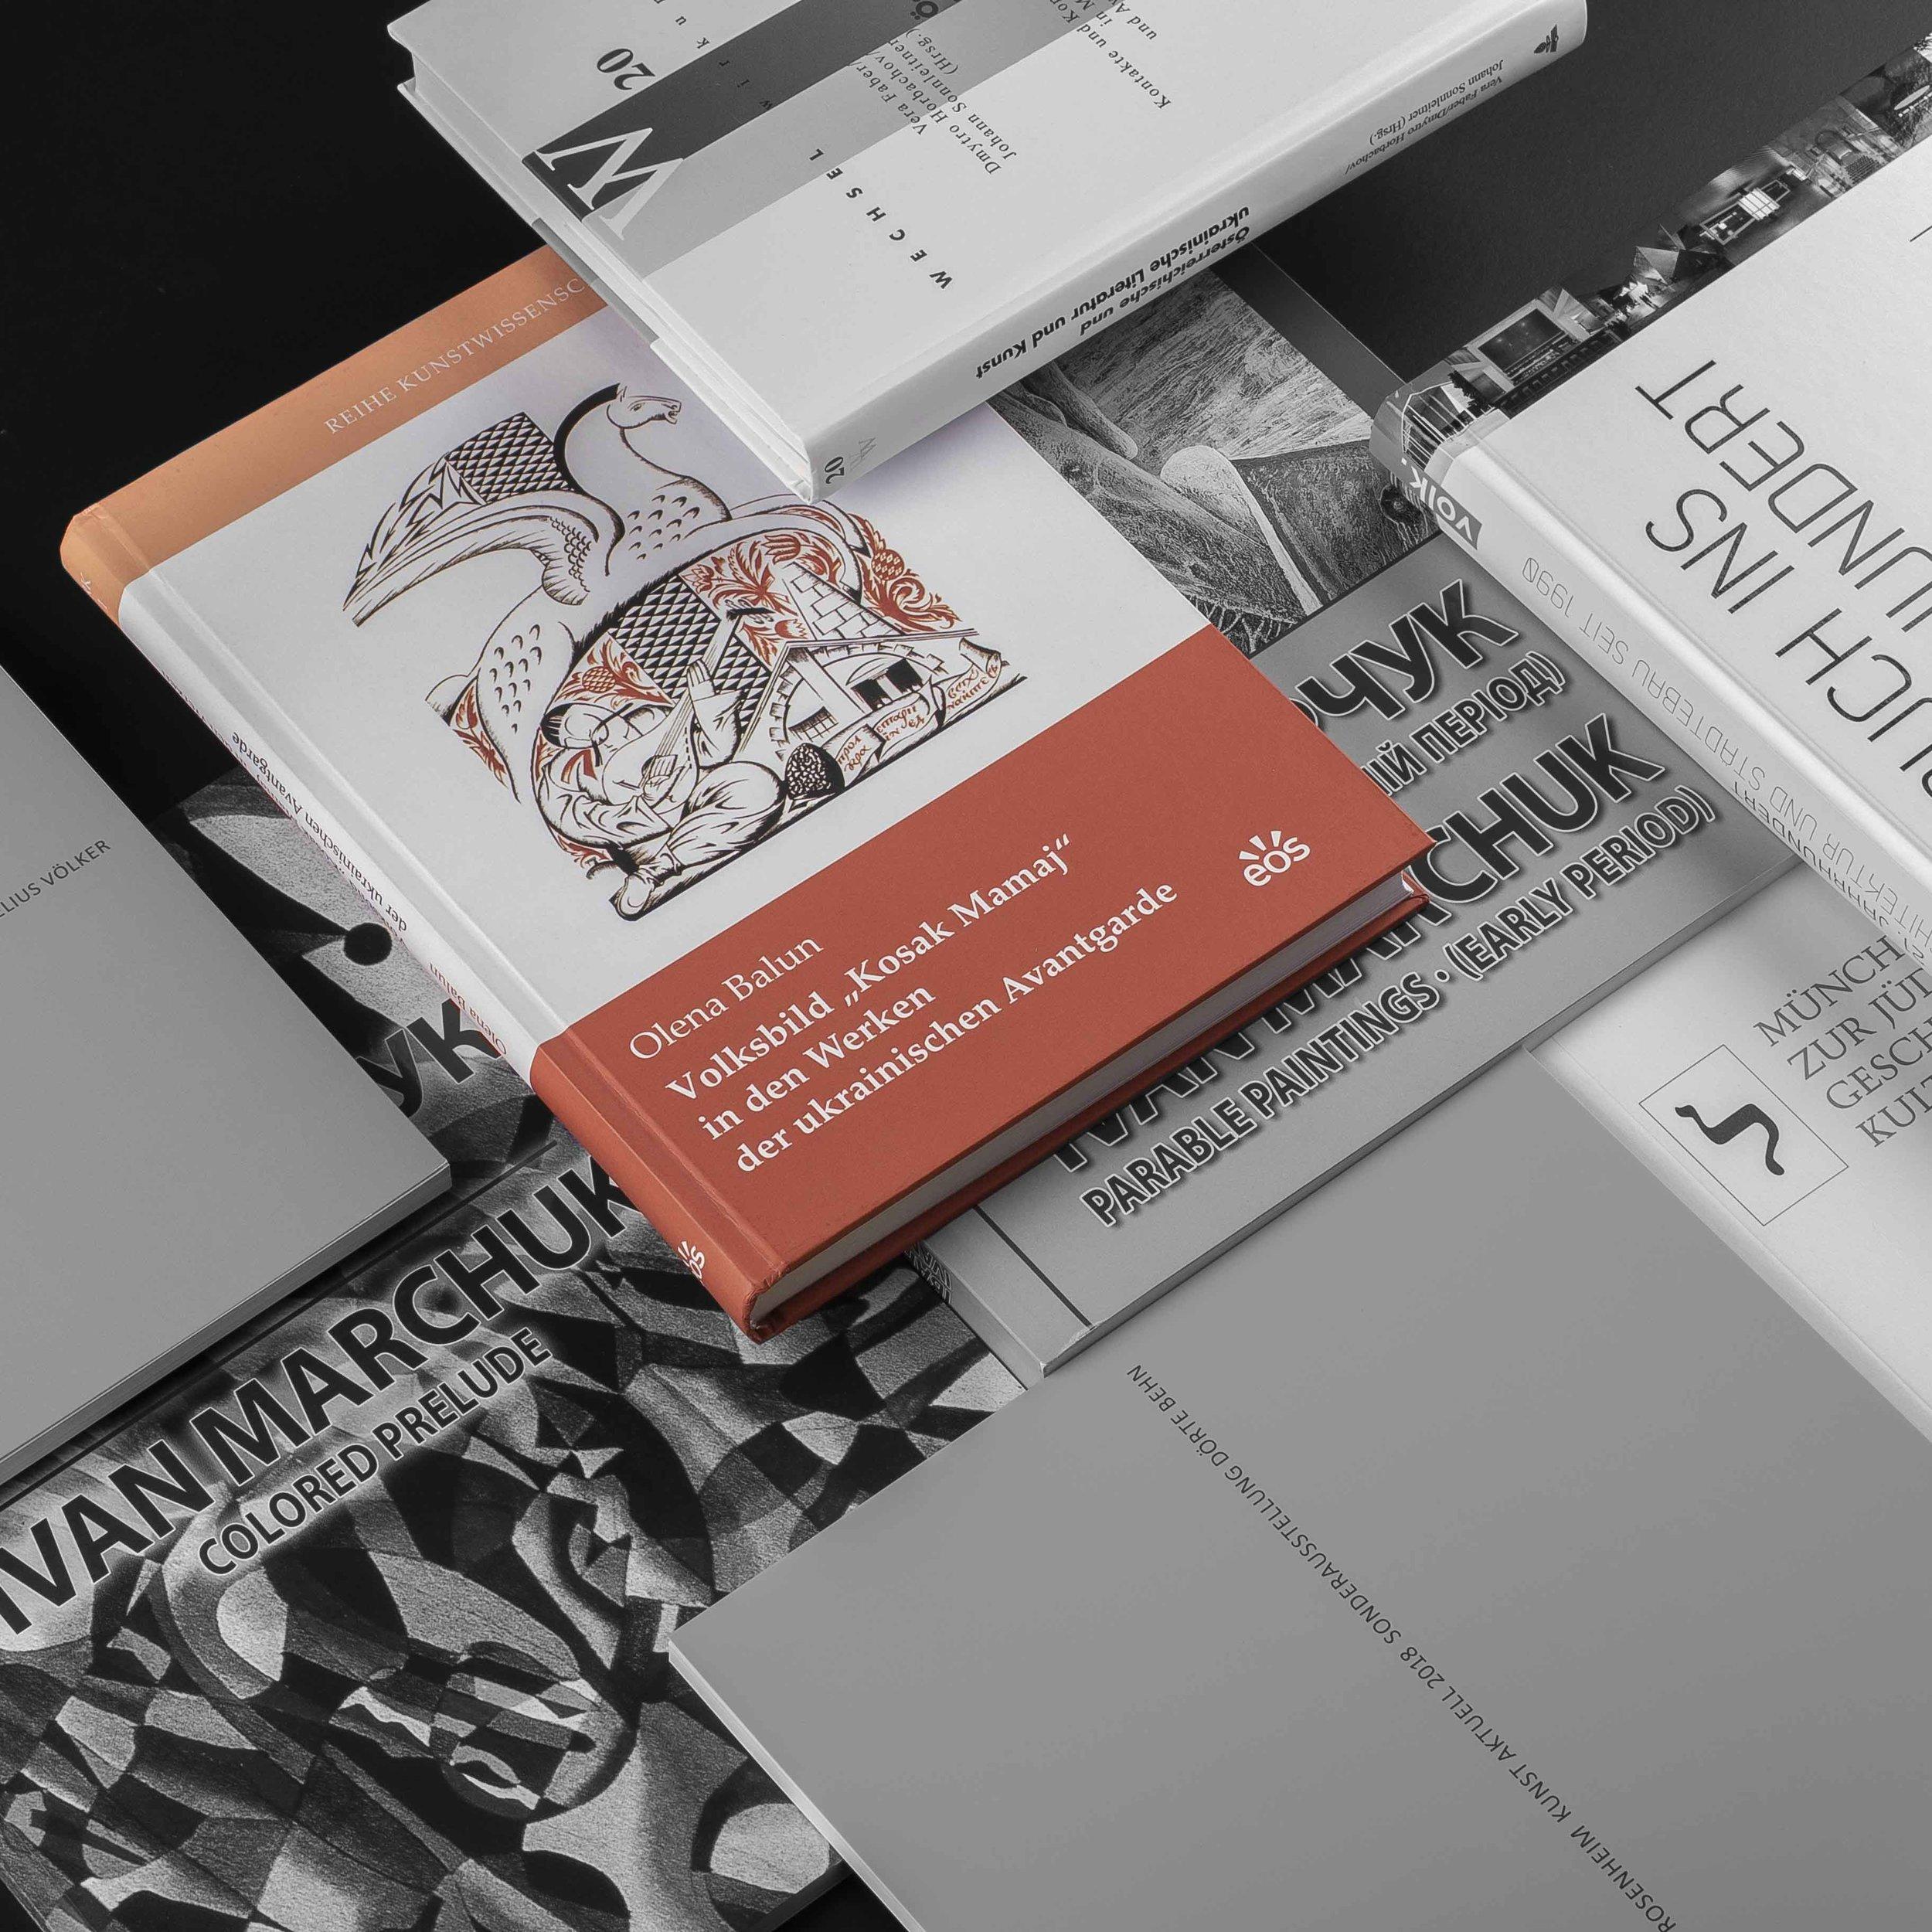 OlenaBalun_Titel_Publikationen.jpg